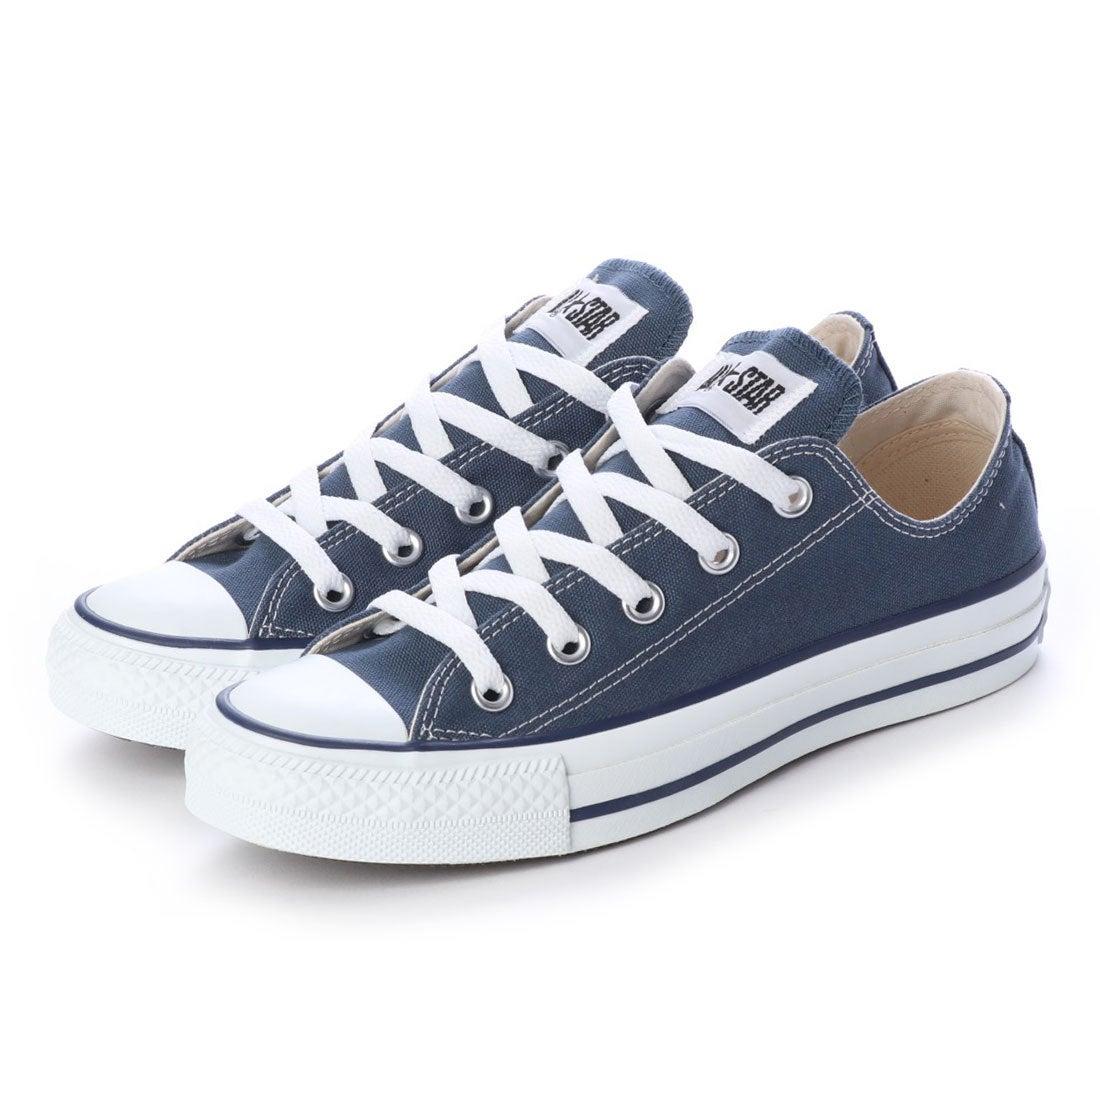 e5149260f410cf コンバース キャンバスオールスターOX / CONVERSE M9697CVS AS OX (ネイビー) -靴&ファッション通販  ロコンド〜自宅で試着、気軽に返品